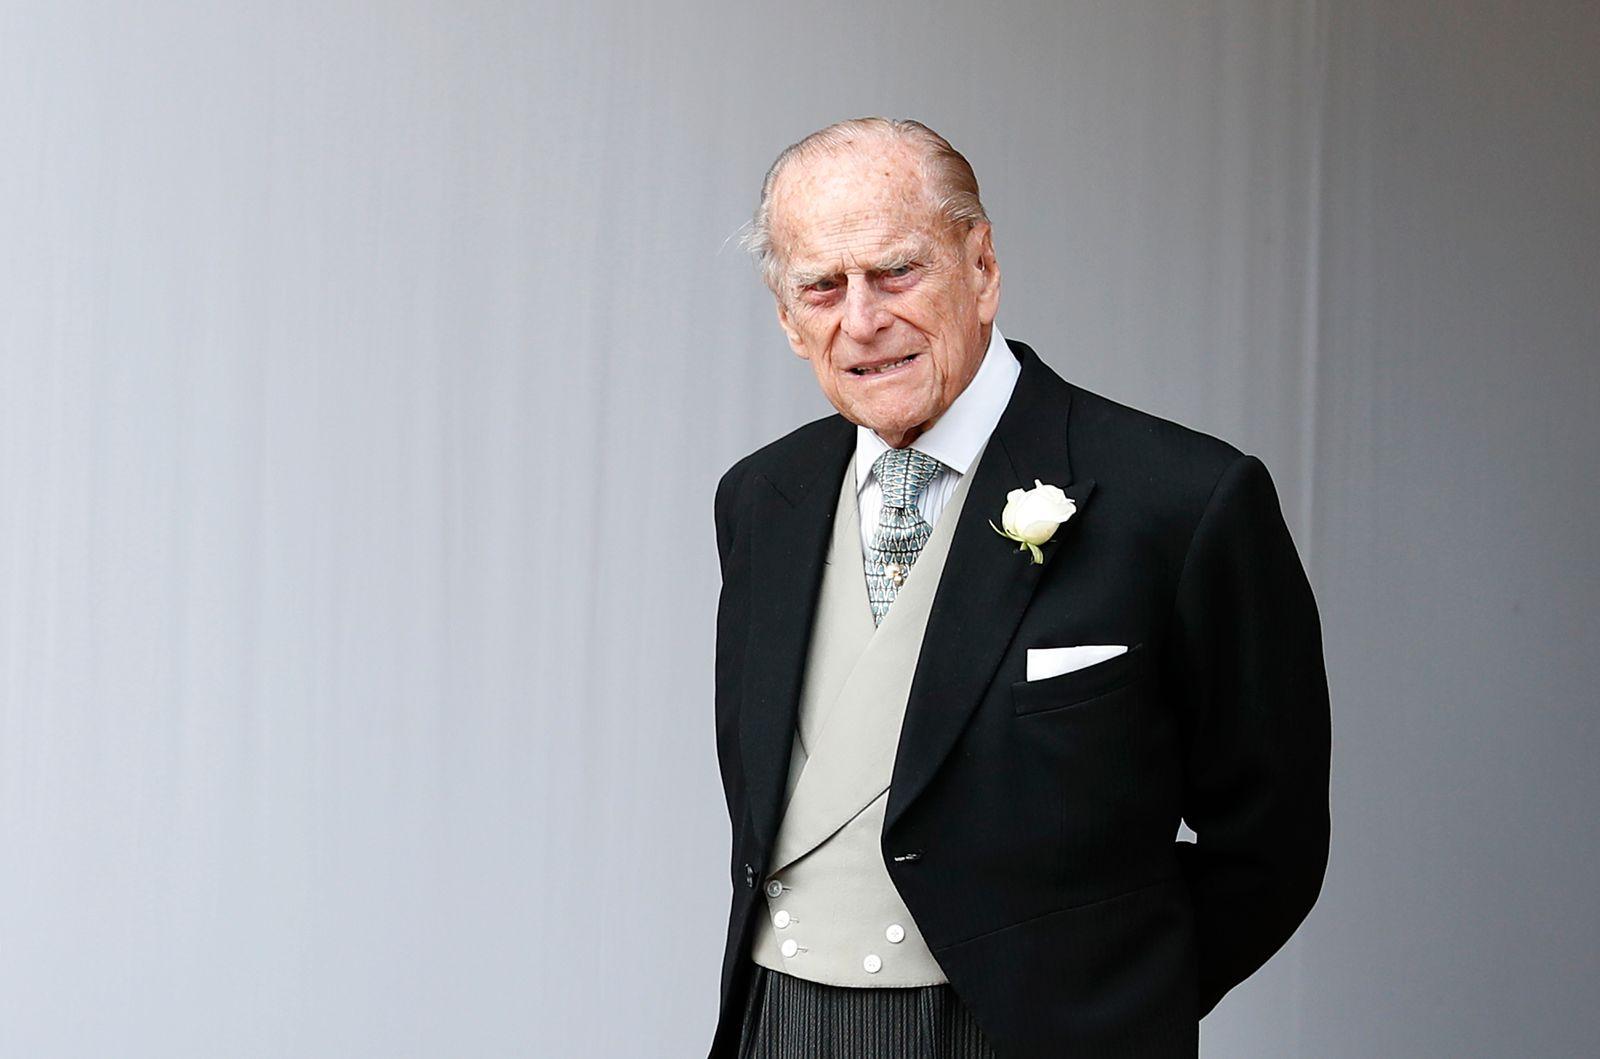 Prince Philip, Duke Of Edinburgh Dies at the Age of 99 Princess Eugenie Of York Marries Mr. Jack Brooksbank